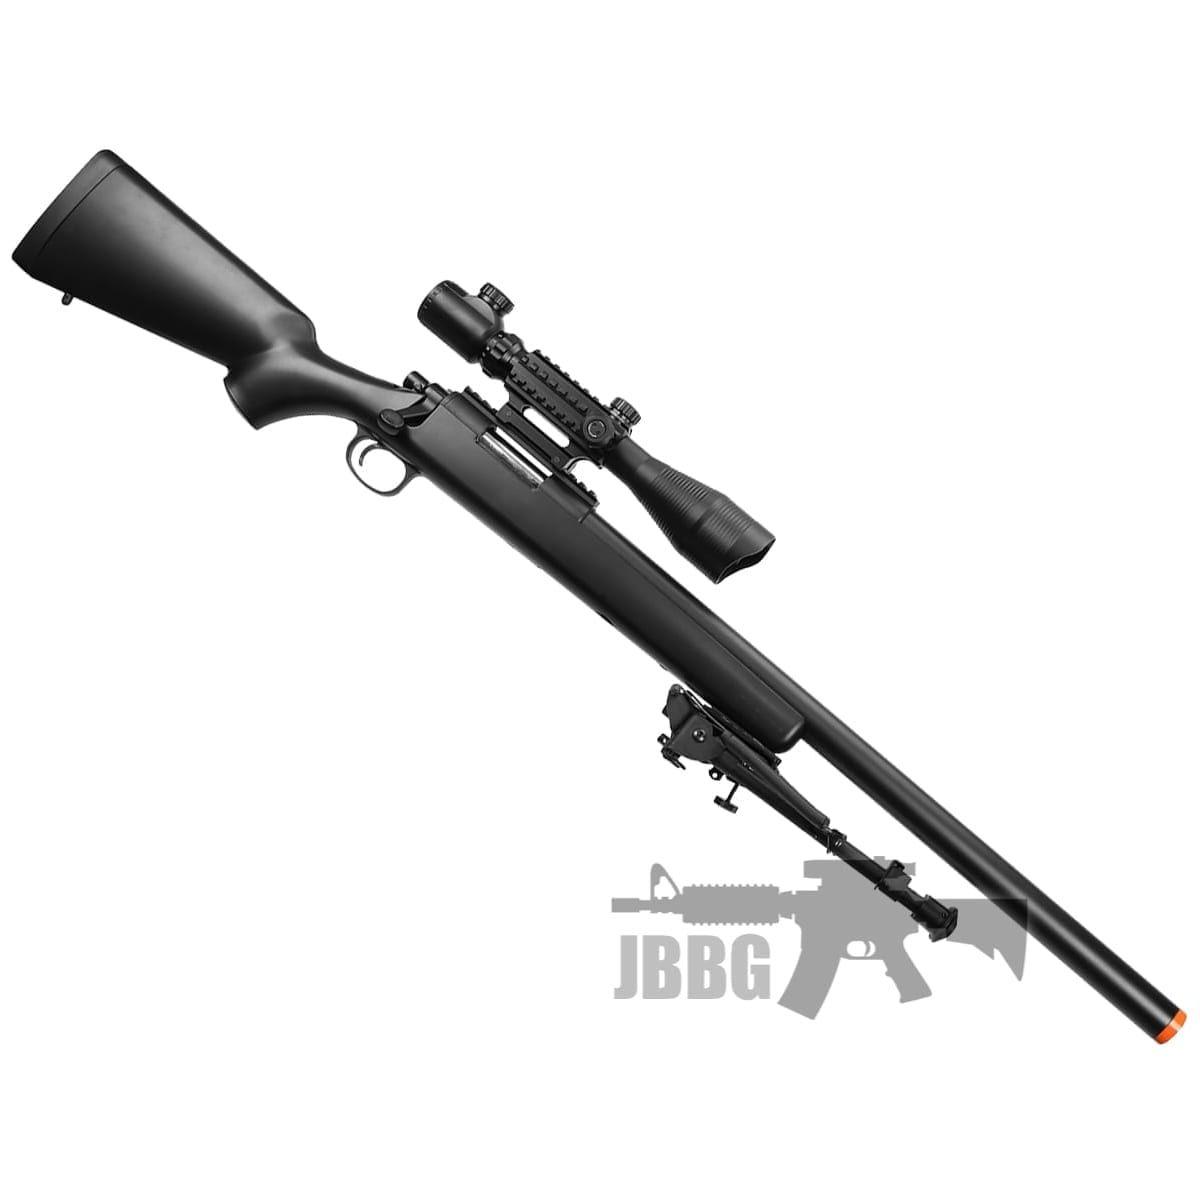 vsr11 sniper rifle